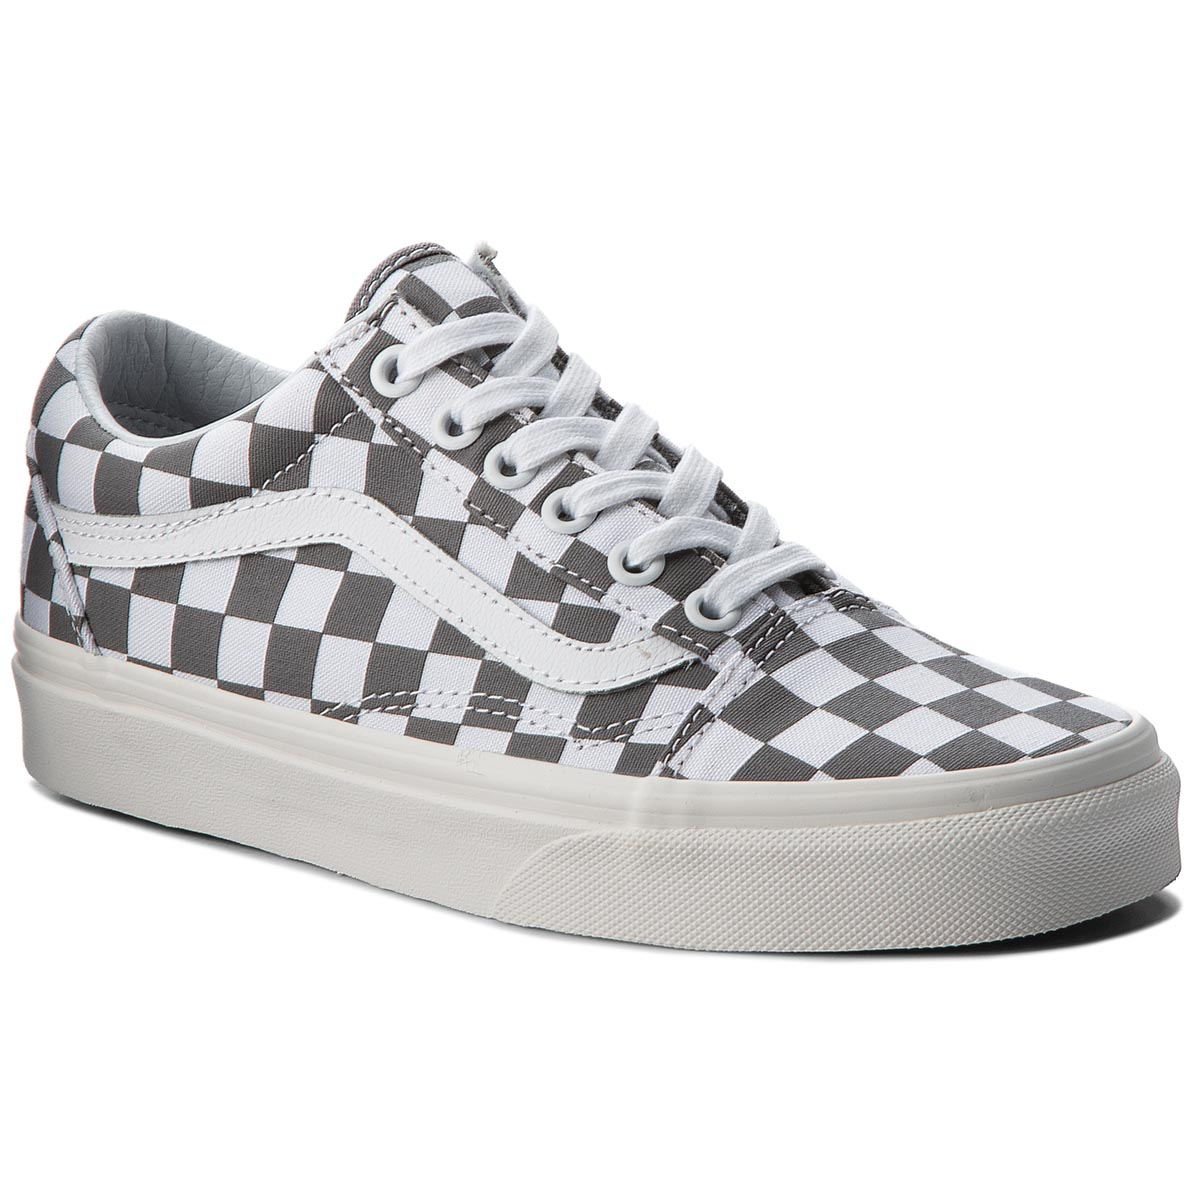 Tenisky VANS - Old Skool VN0A38G1U53 (Checkerboard) Pewter/Marshmallow